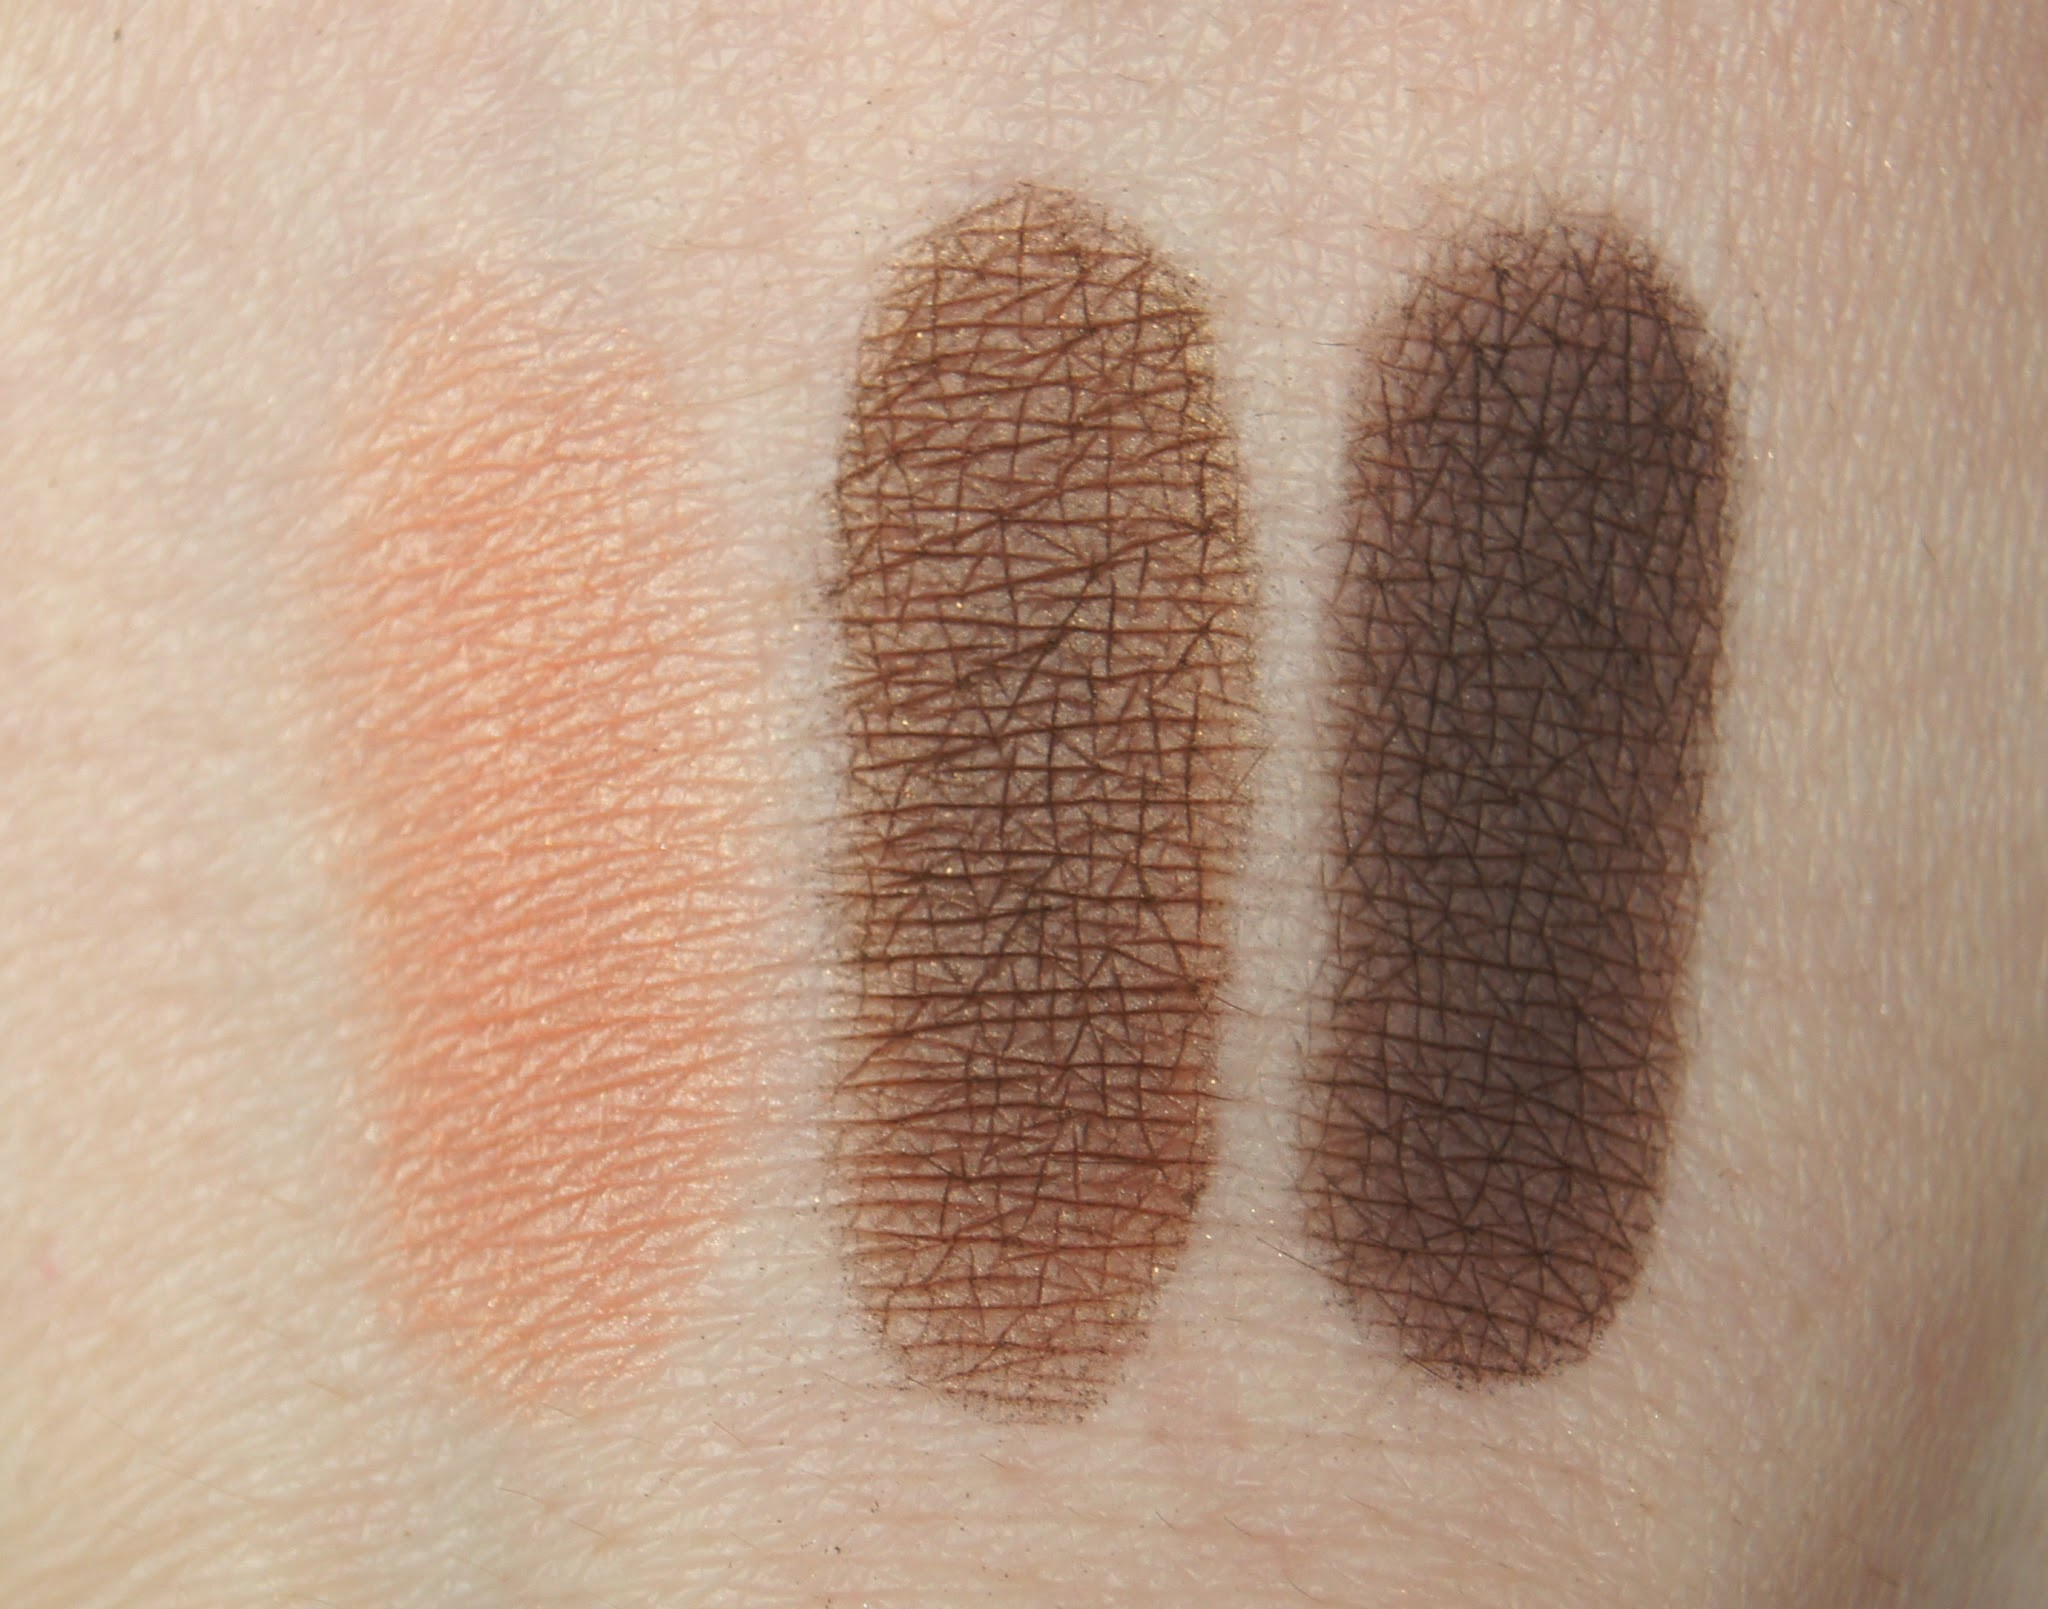 Smashbox Eyeshadow Swatches Coral Bronze Cocoa